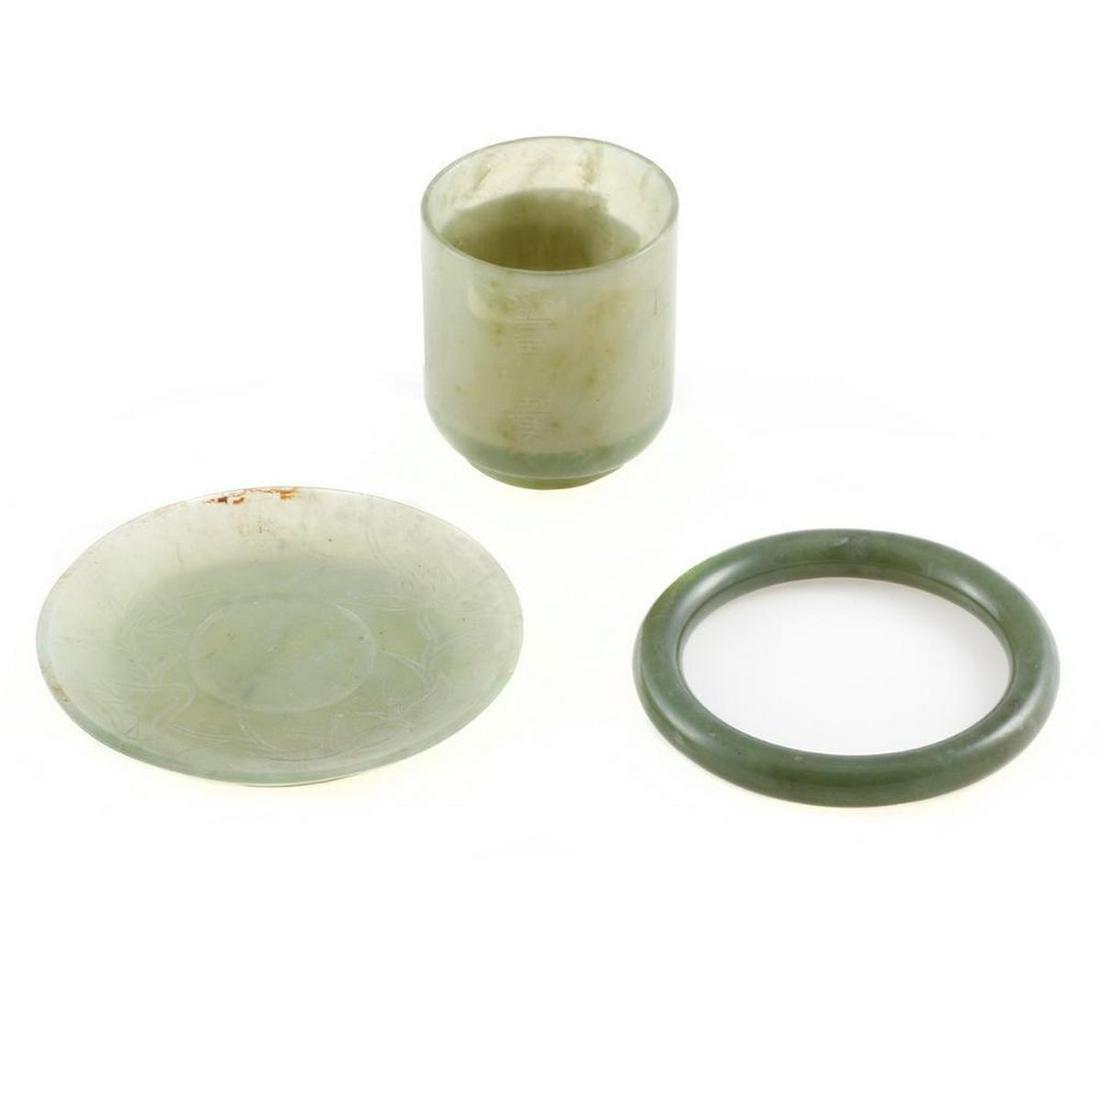 Jade bangle bracelet with nephrite cup & saucer